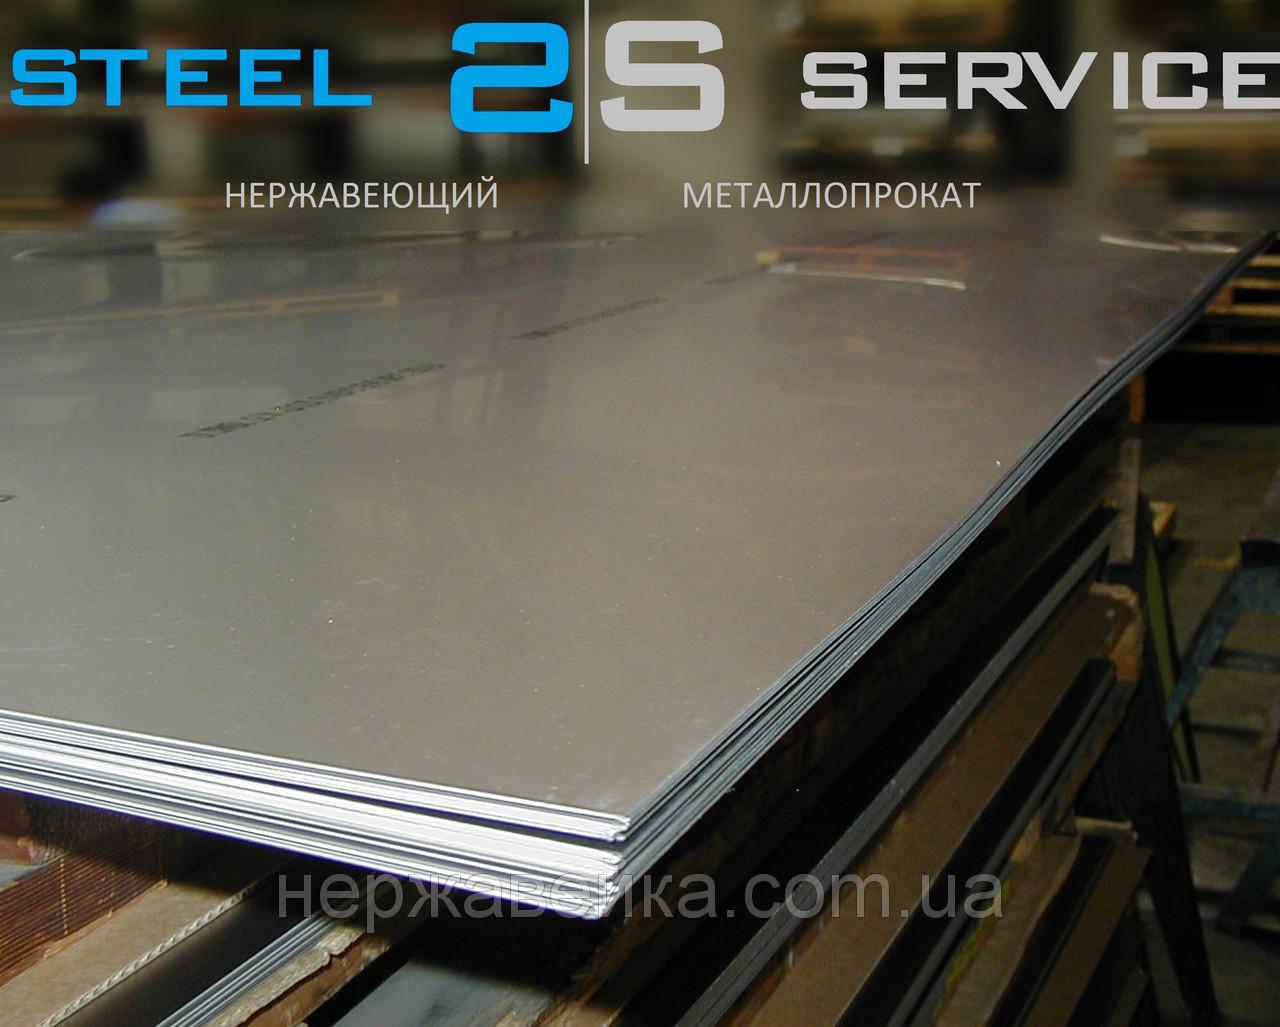 Нержавейка лист 16х1000х2000мм  AISI 316L(03Х17Н14М3) F1 - горячекатанный,  кислотостойкий